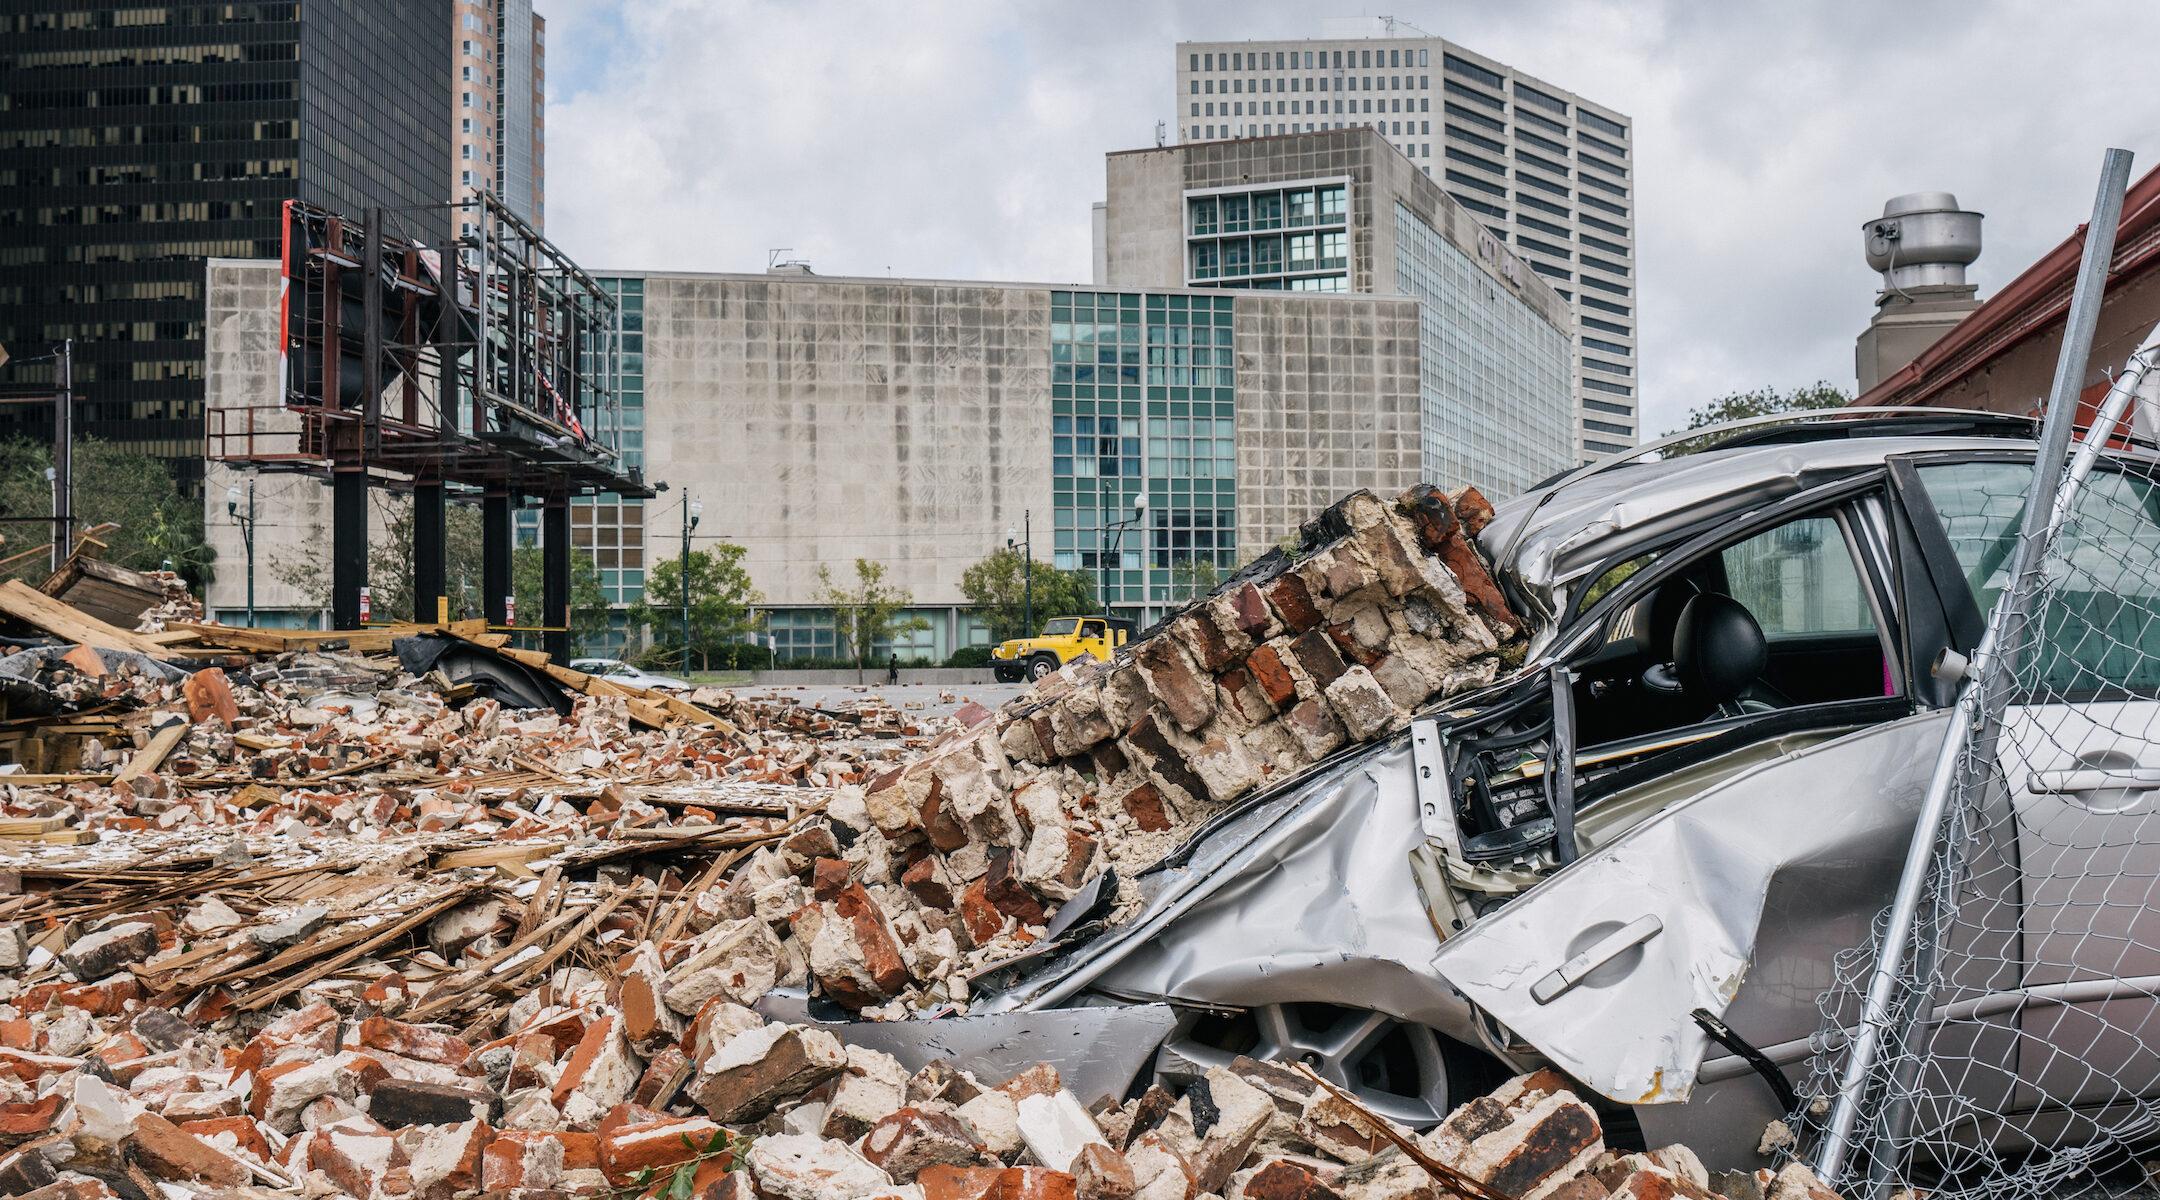 A car is seen under rubble